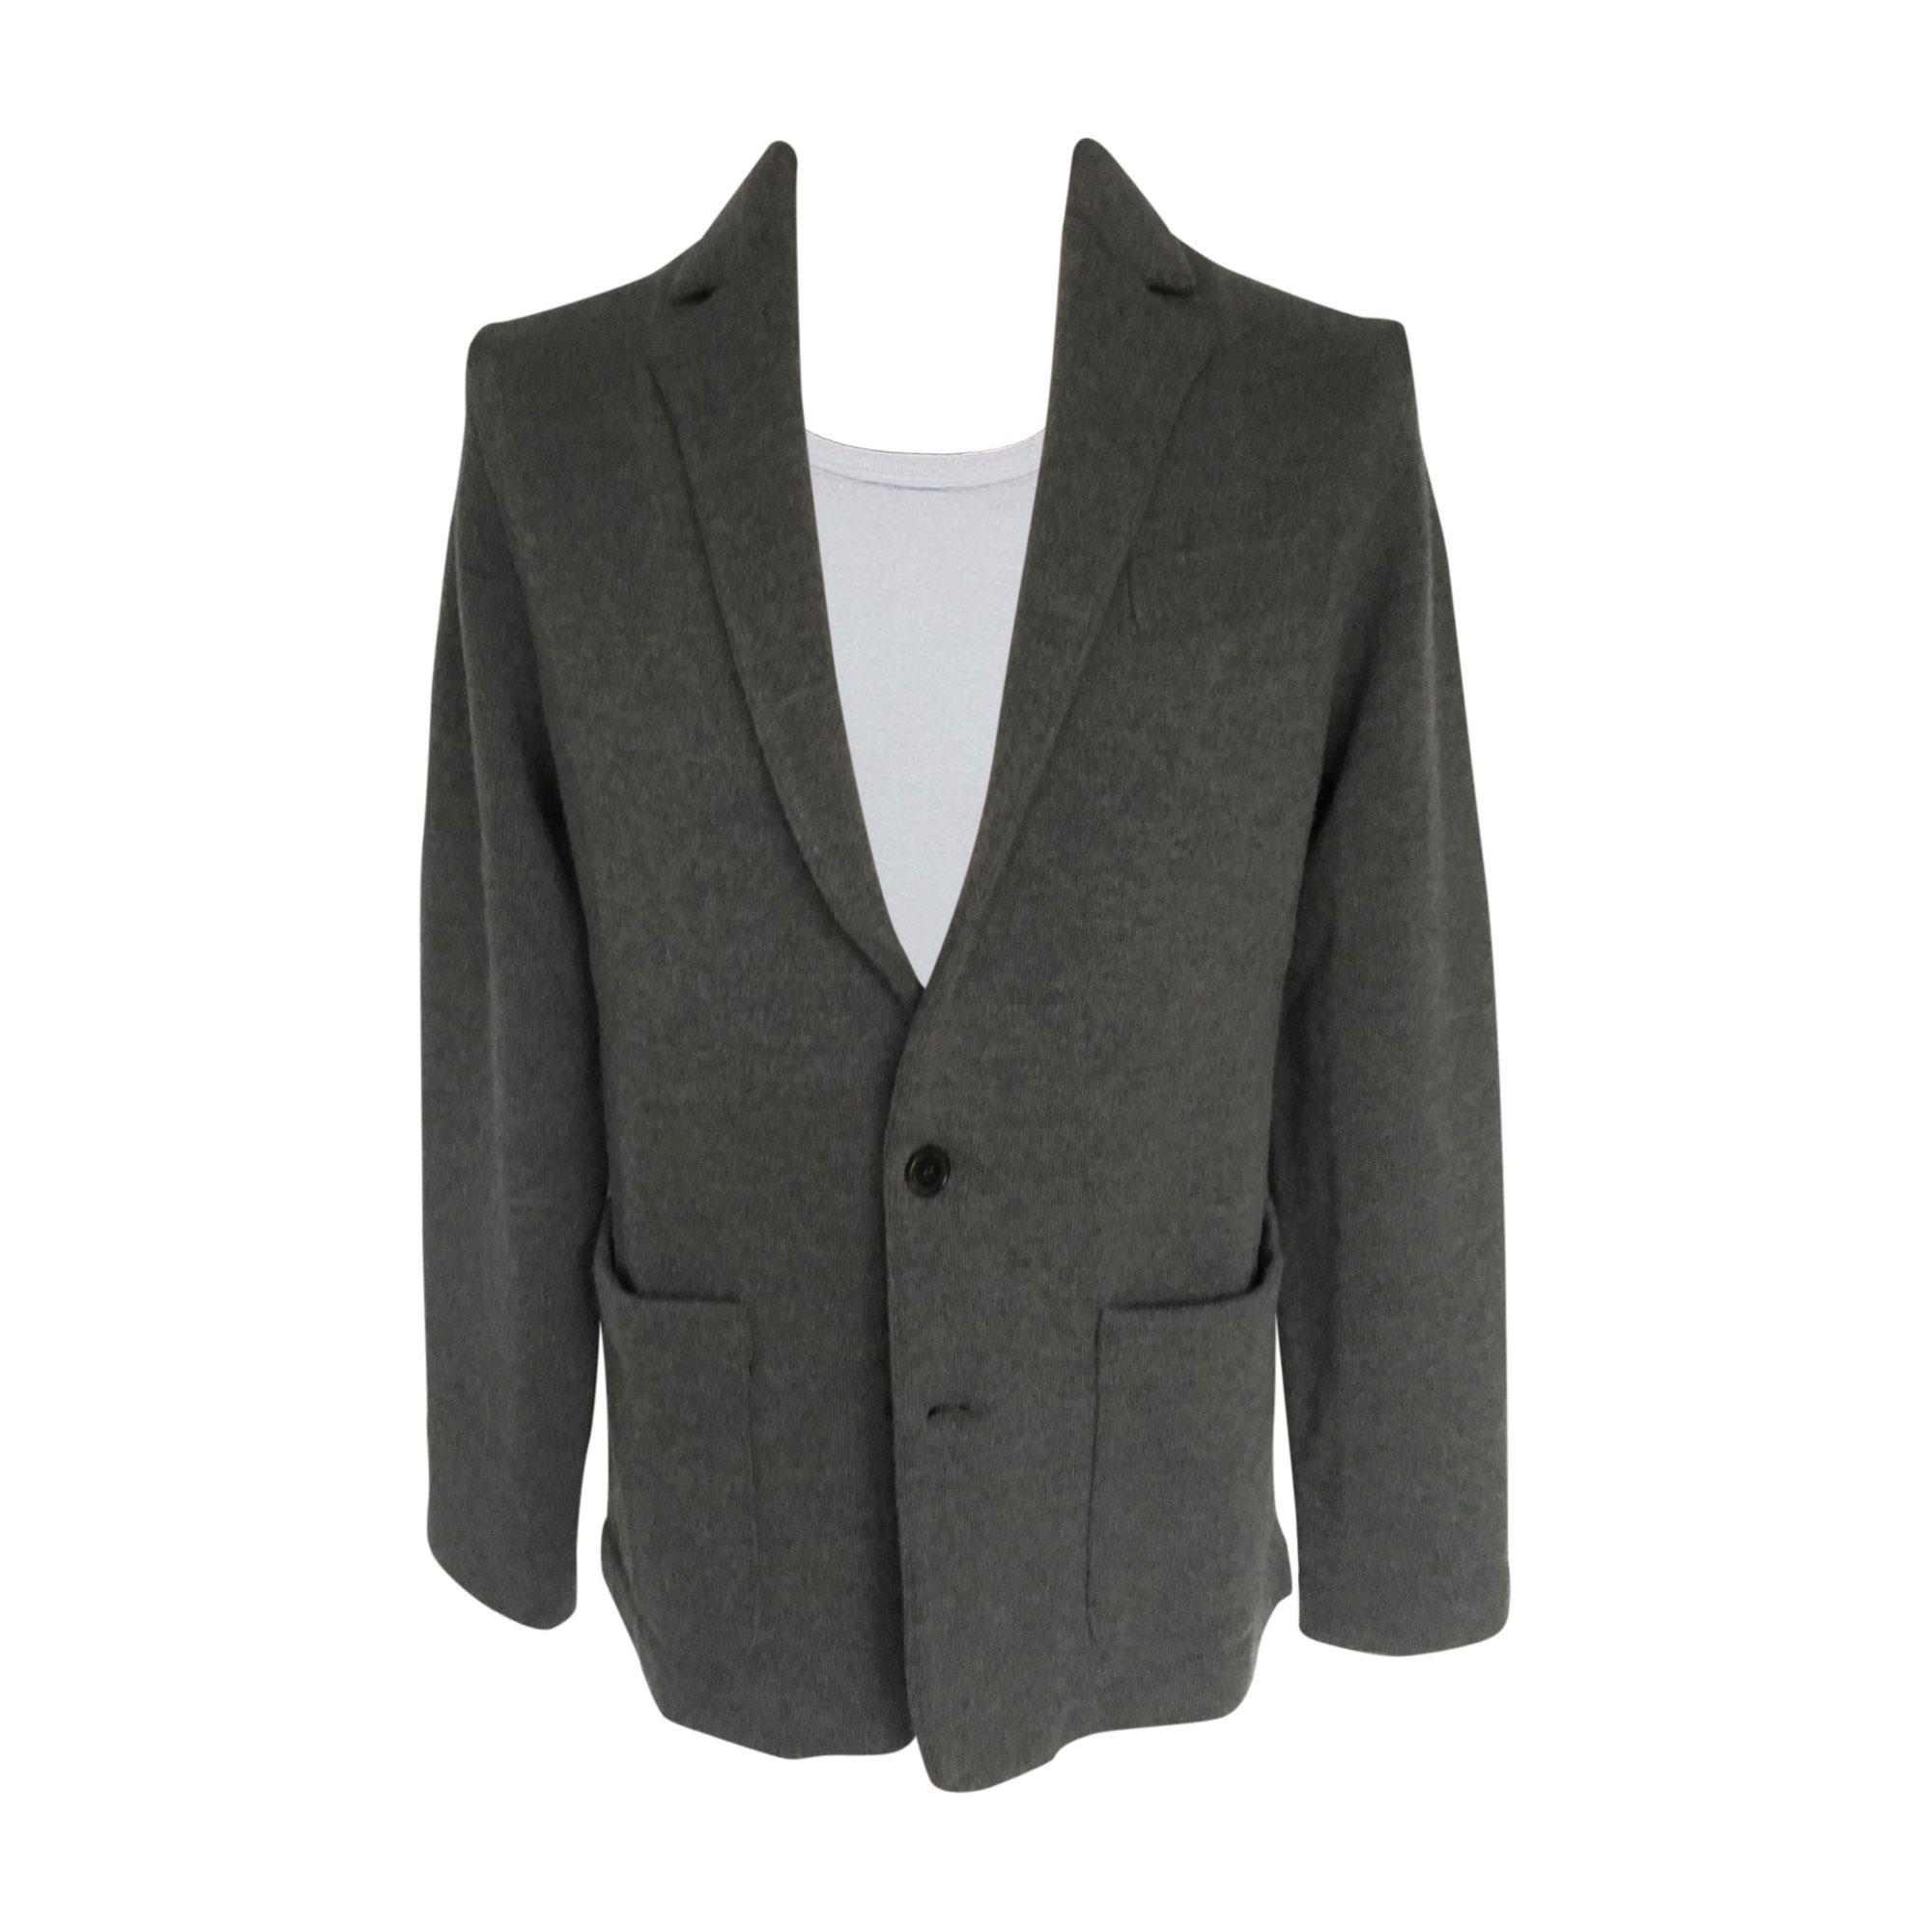 hot sales 565e5 cdc13 Veste de costume RALPH LAUREN